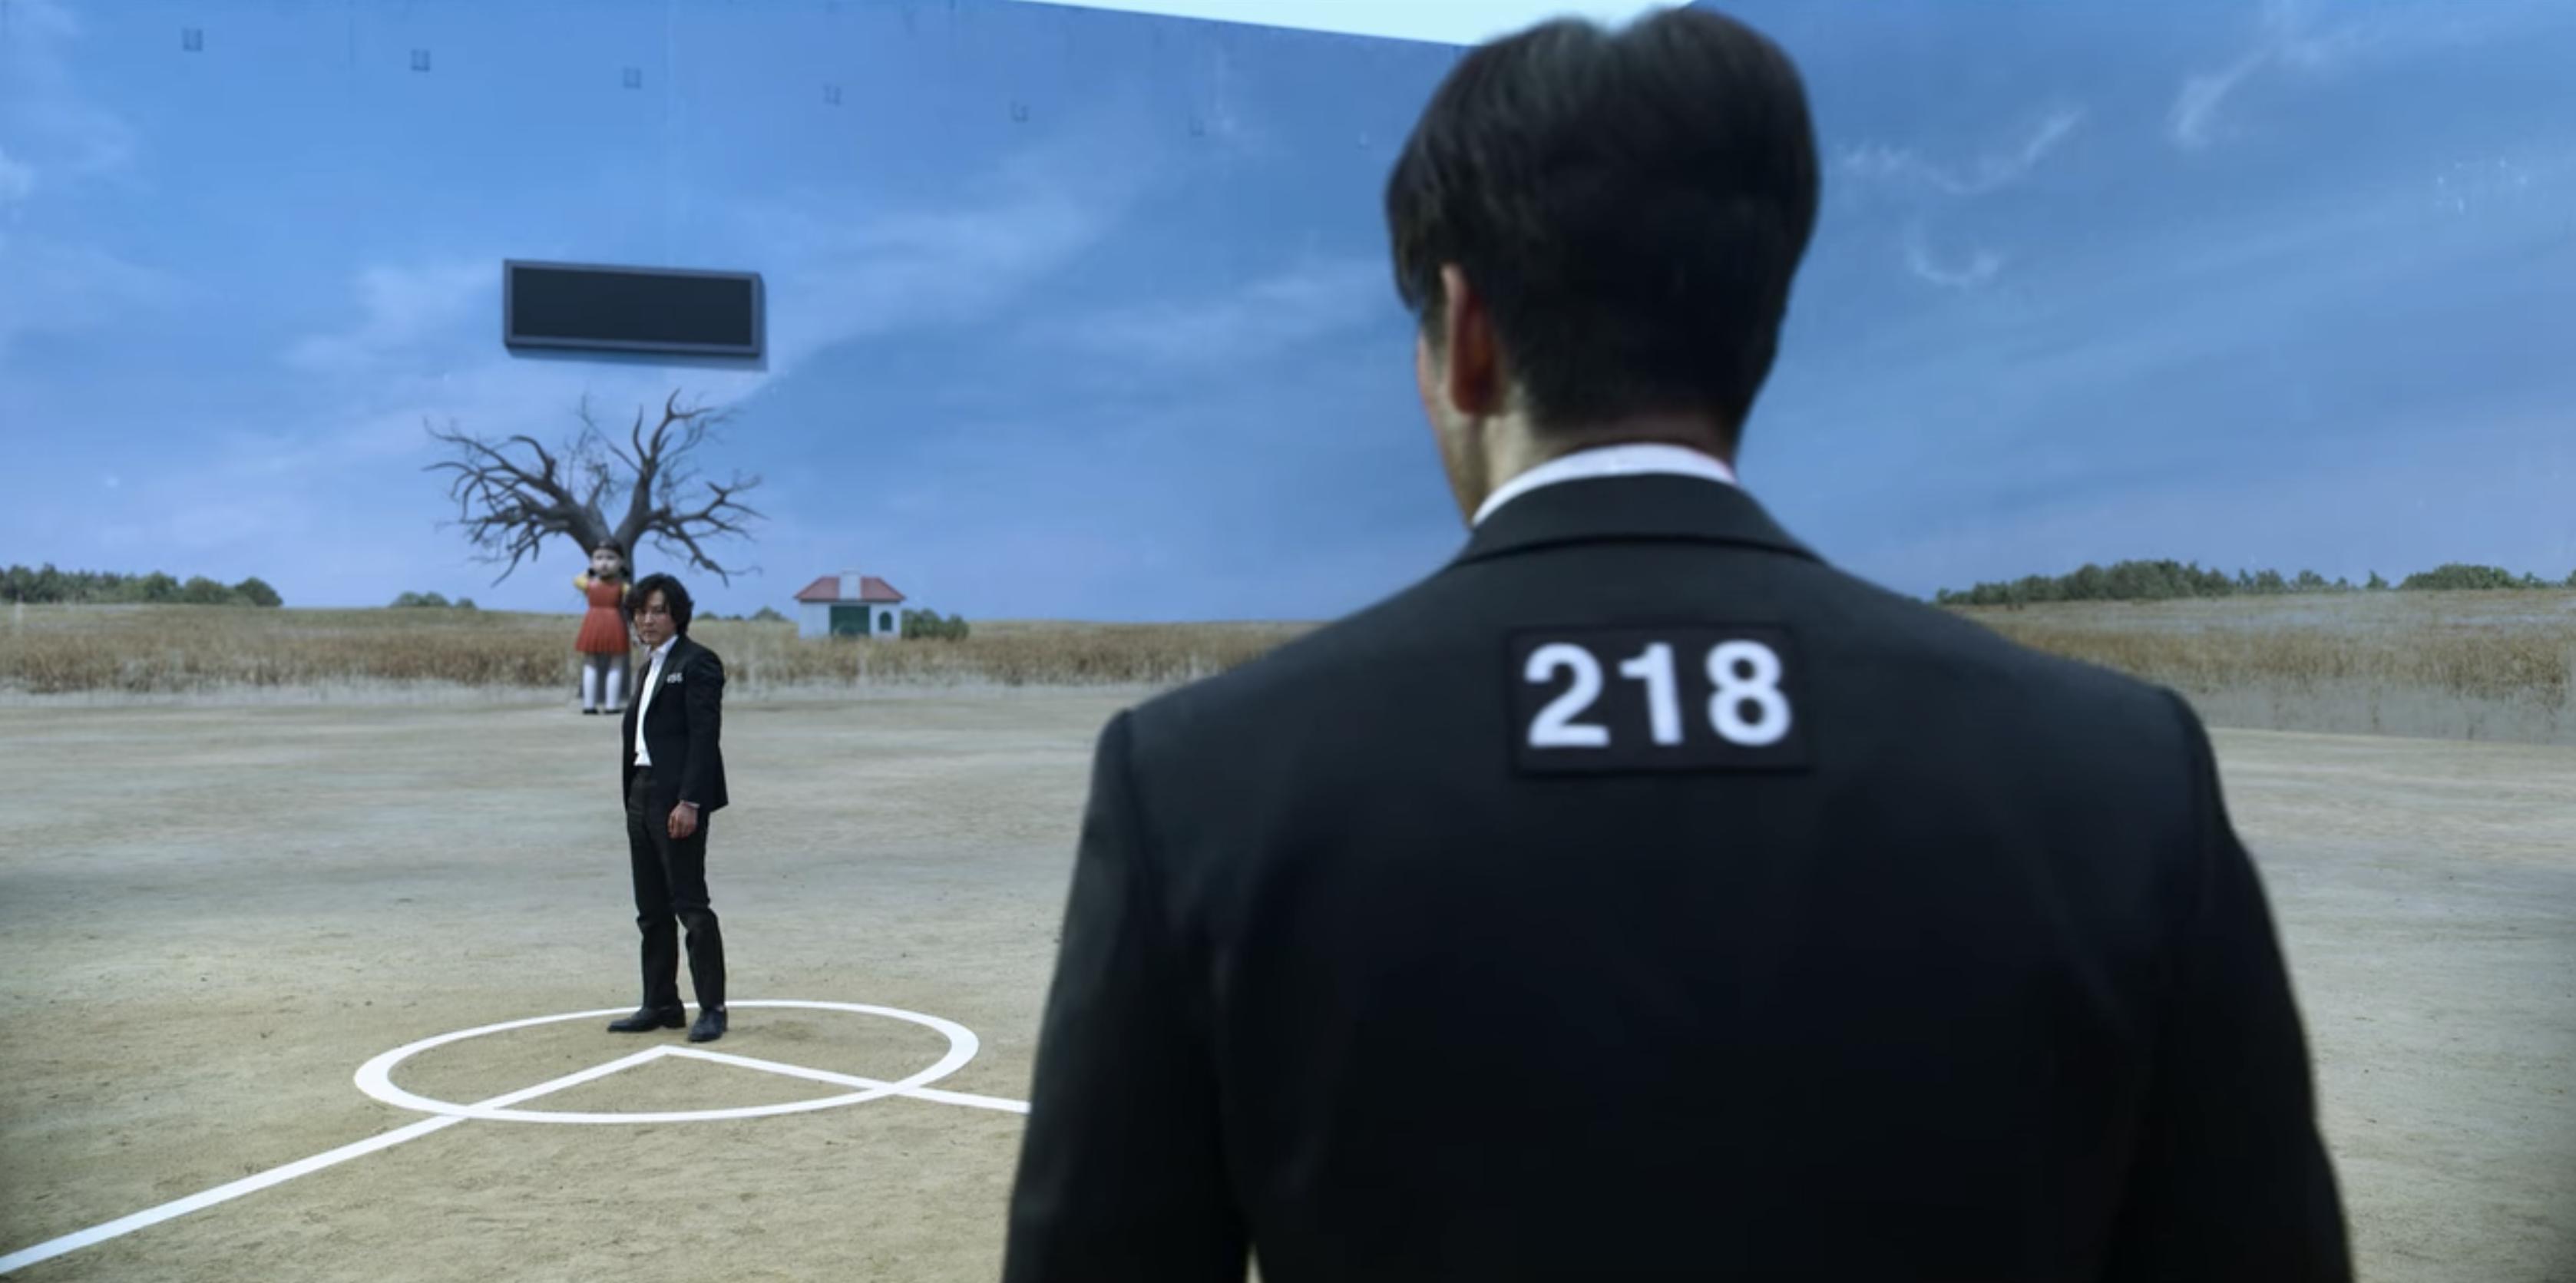 Lee Jung-jae as Seong Gi-hun and Park Hae-soo as Cho Sang-woo in Squid Game